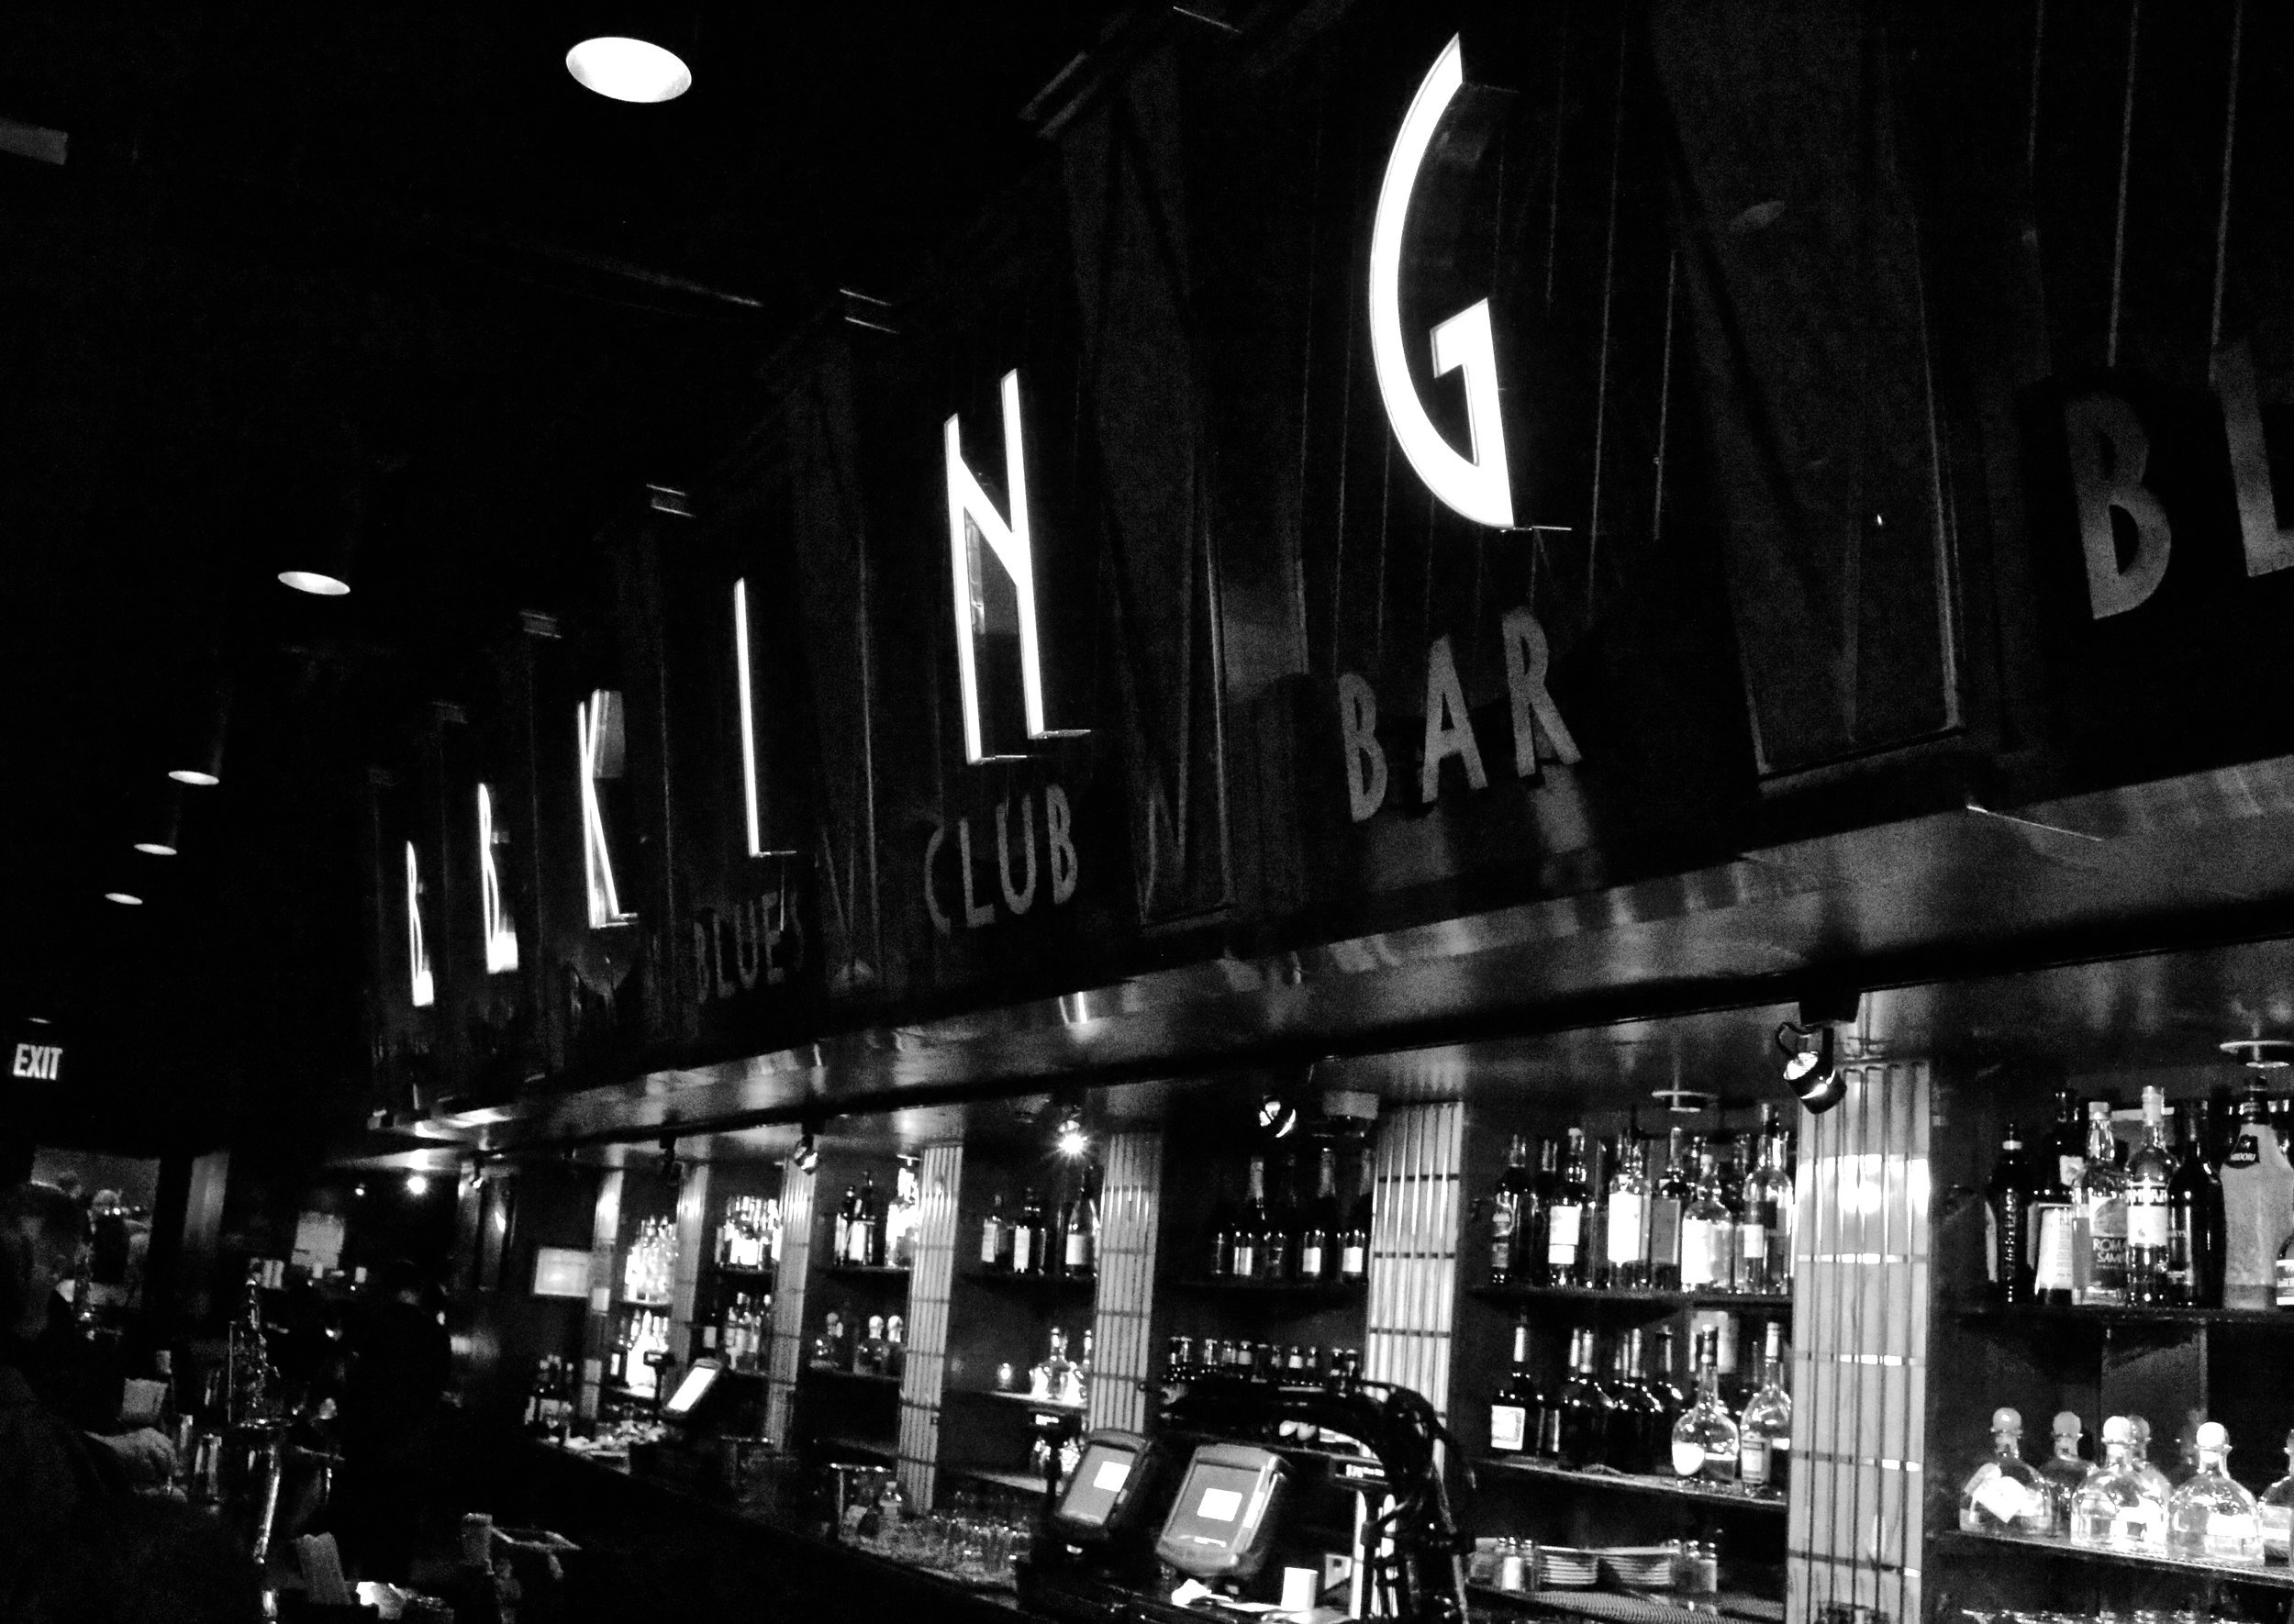 B.B. King's Blues Club, New York, NY.